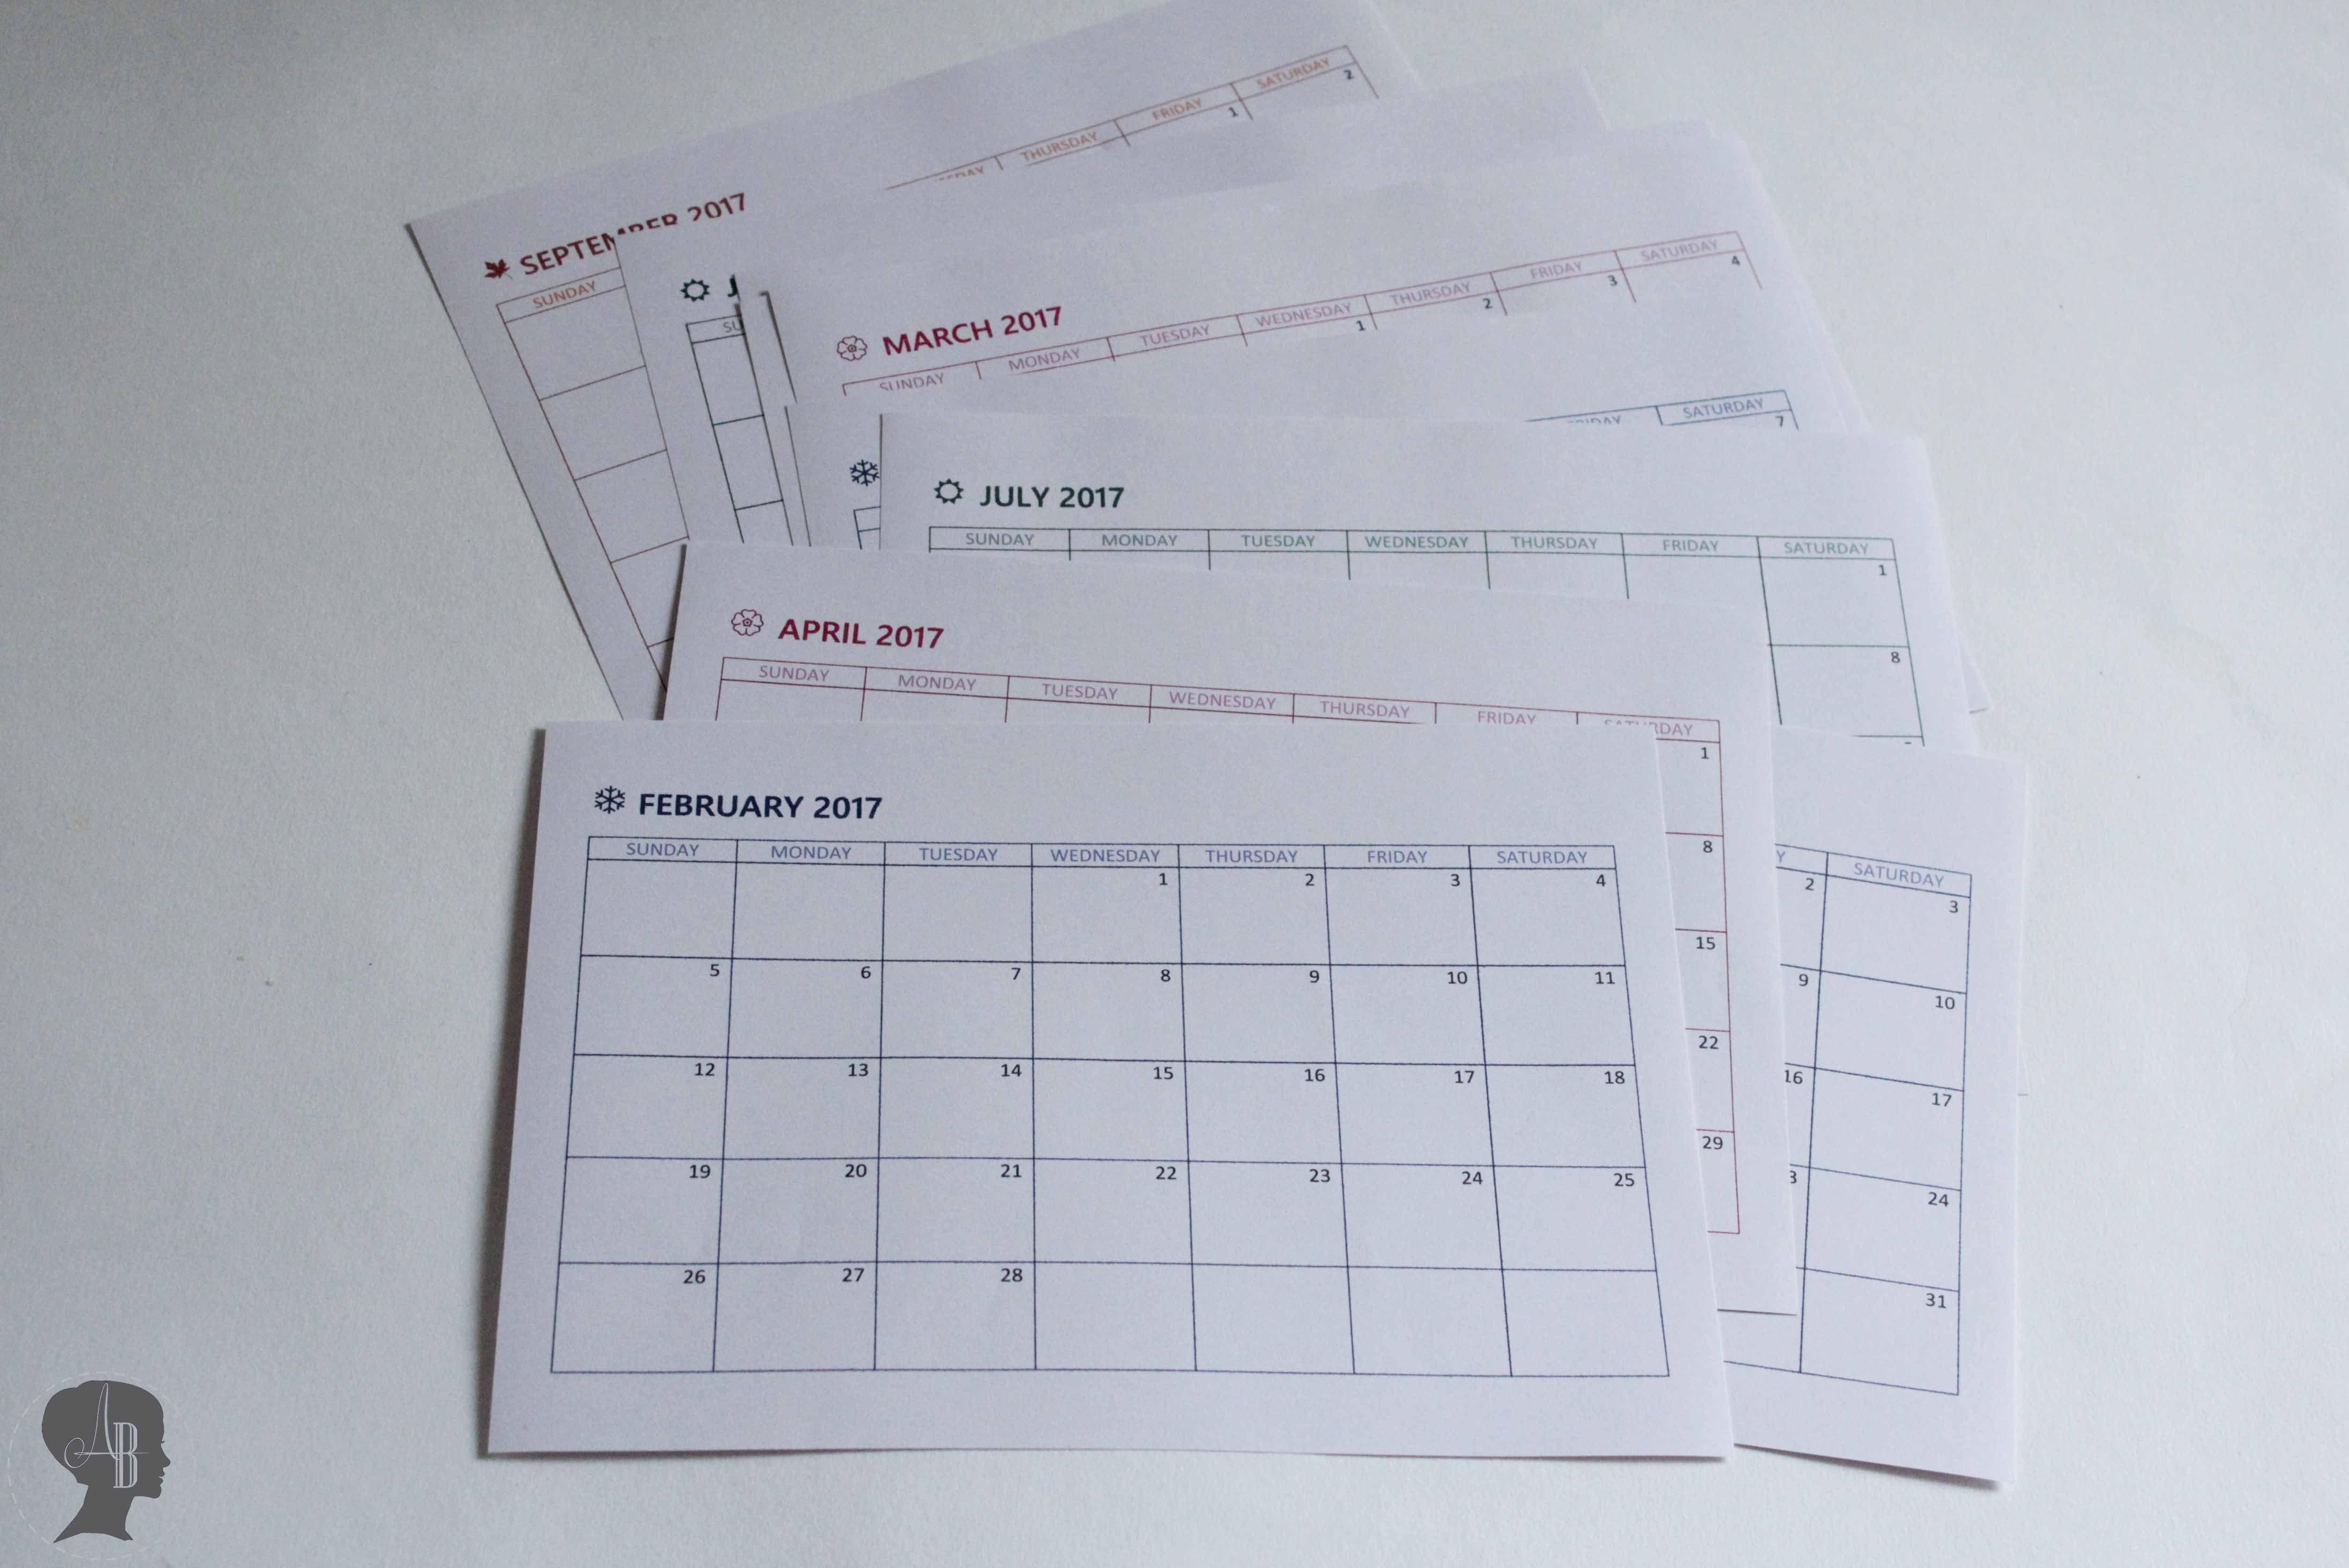 diy kalender 2017 zum drucken filo pinterest diy kalender kalender 2017 und kalender. Black Bedroom Furniture Sets. Home Design Ideas